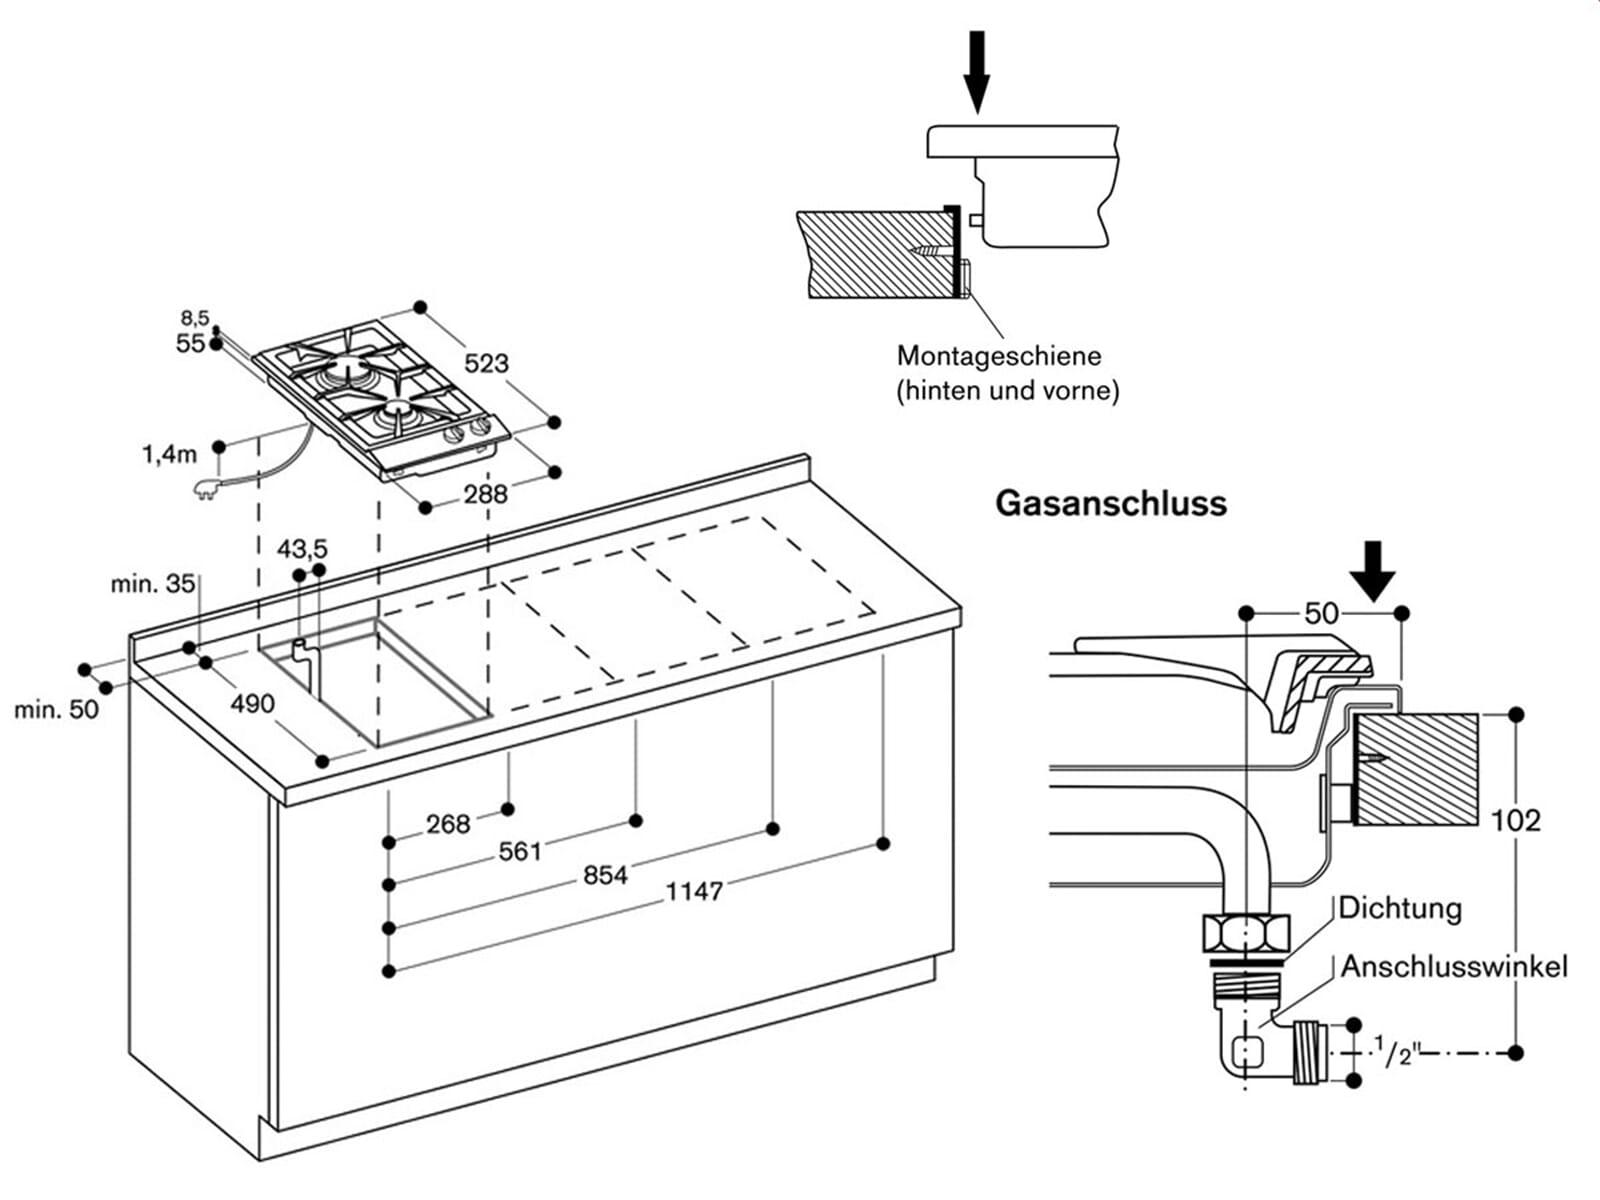 gaggenau vg 232 214 serie 200 domino edelstahl gaskochfeld. Black Bedroom Furniture Sets. Home Design Ideas